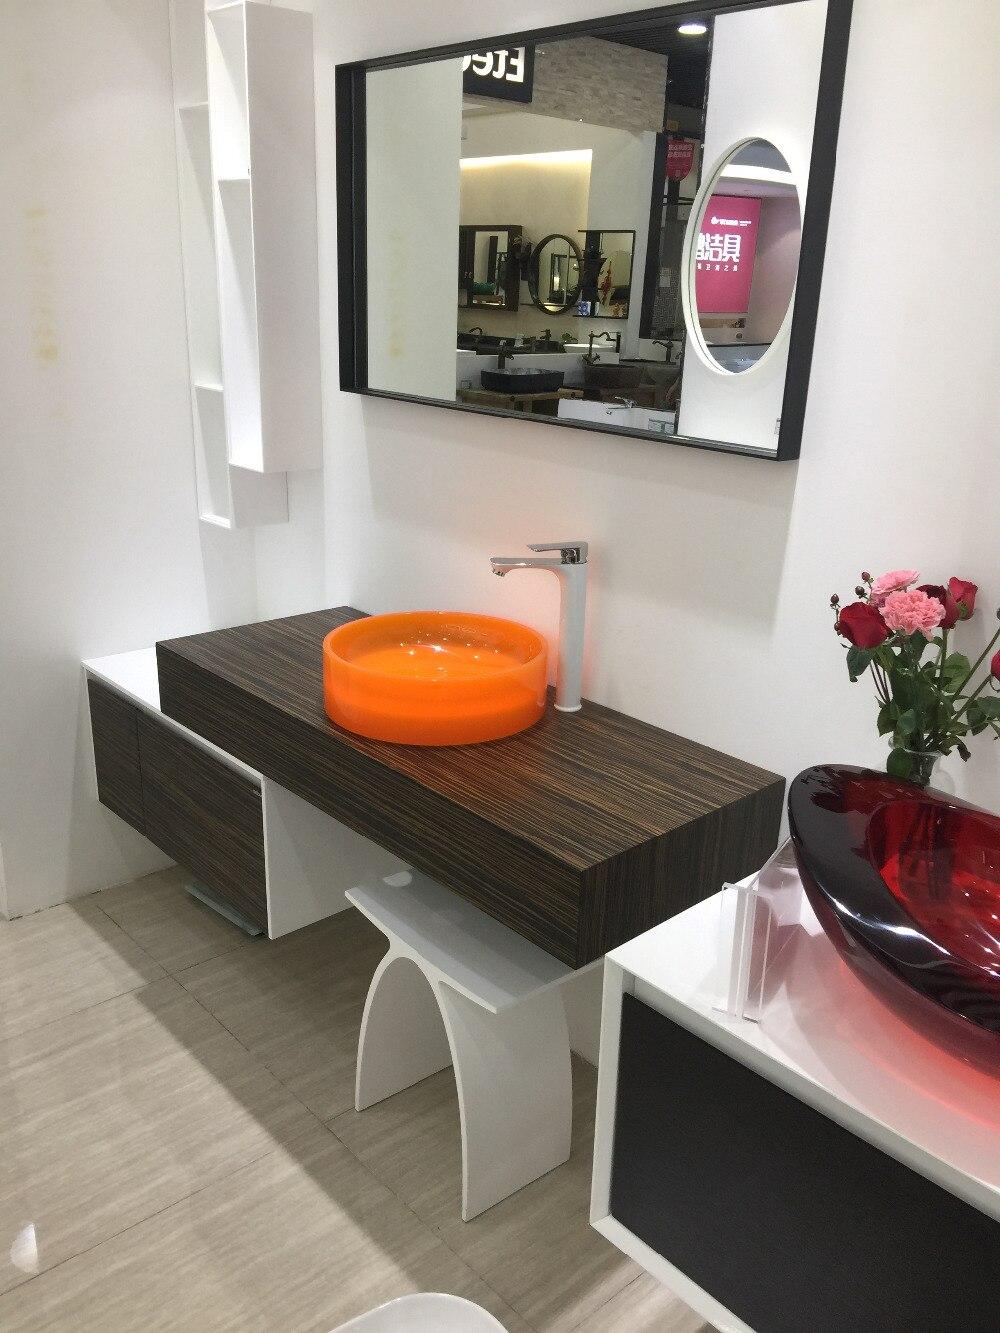 Bathroom Round Resin Counter Top Orange Sink Vessel Cloakroom